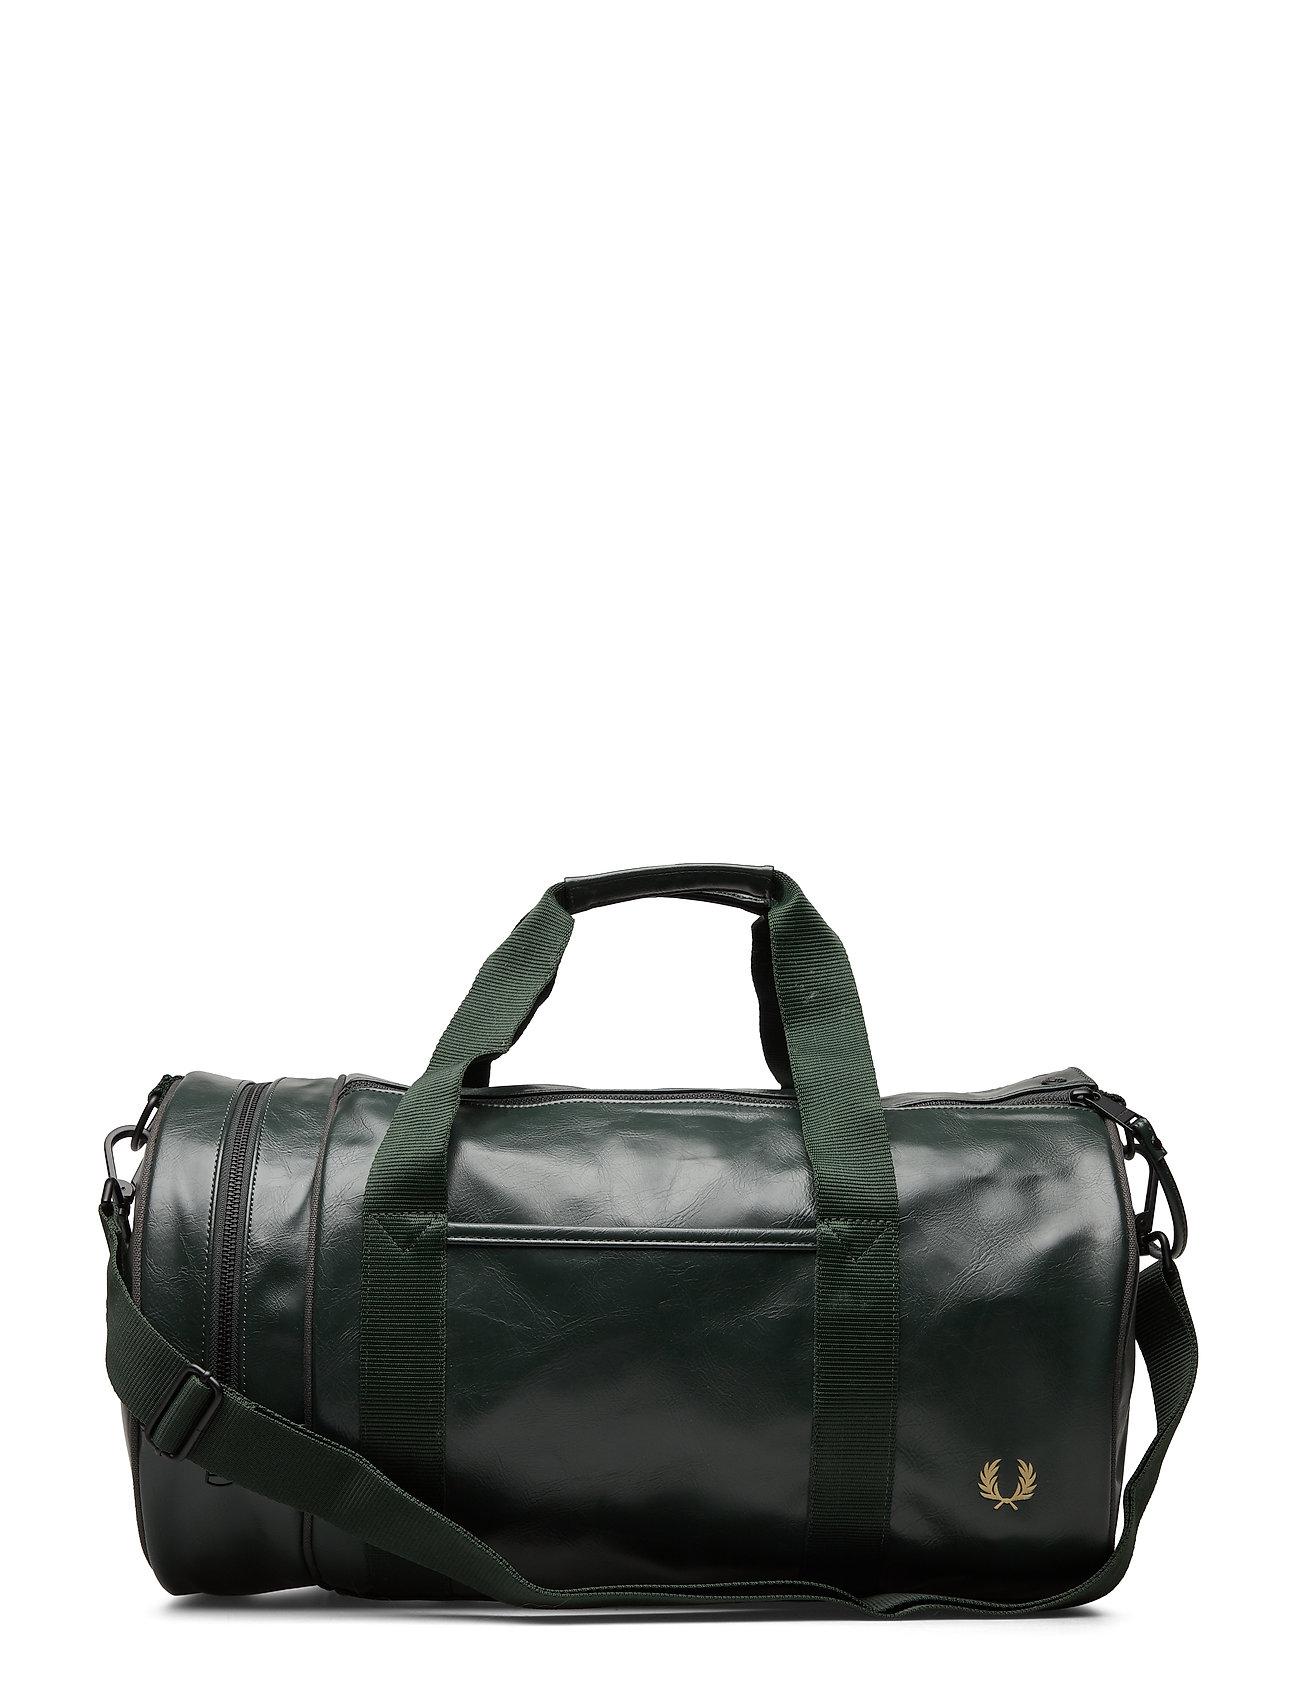 Fred Perry Tonal Pu Barrel Bag - DARK GREEN